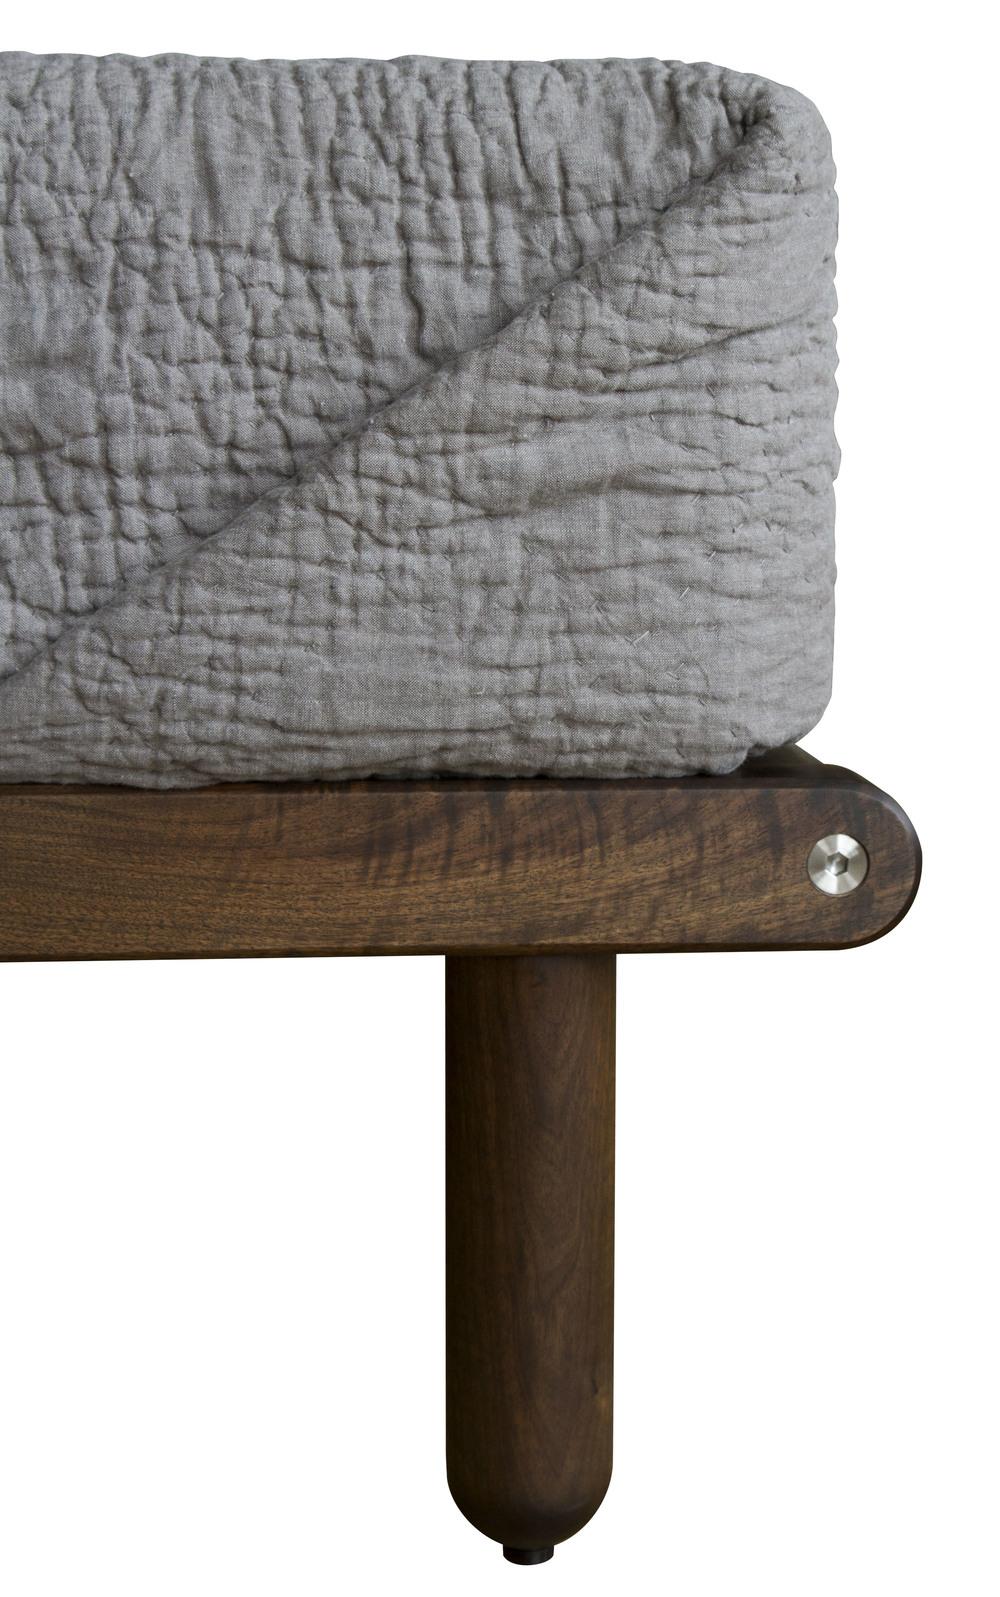 Isaksen Bed - Leg Detail